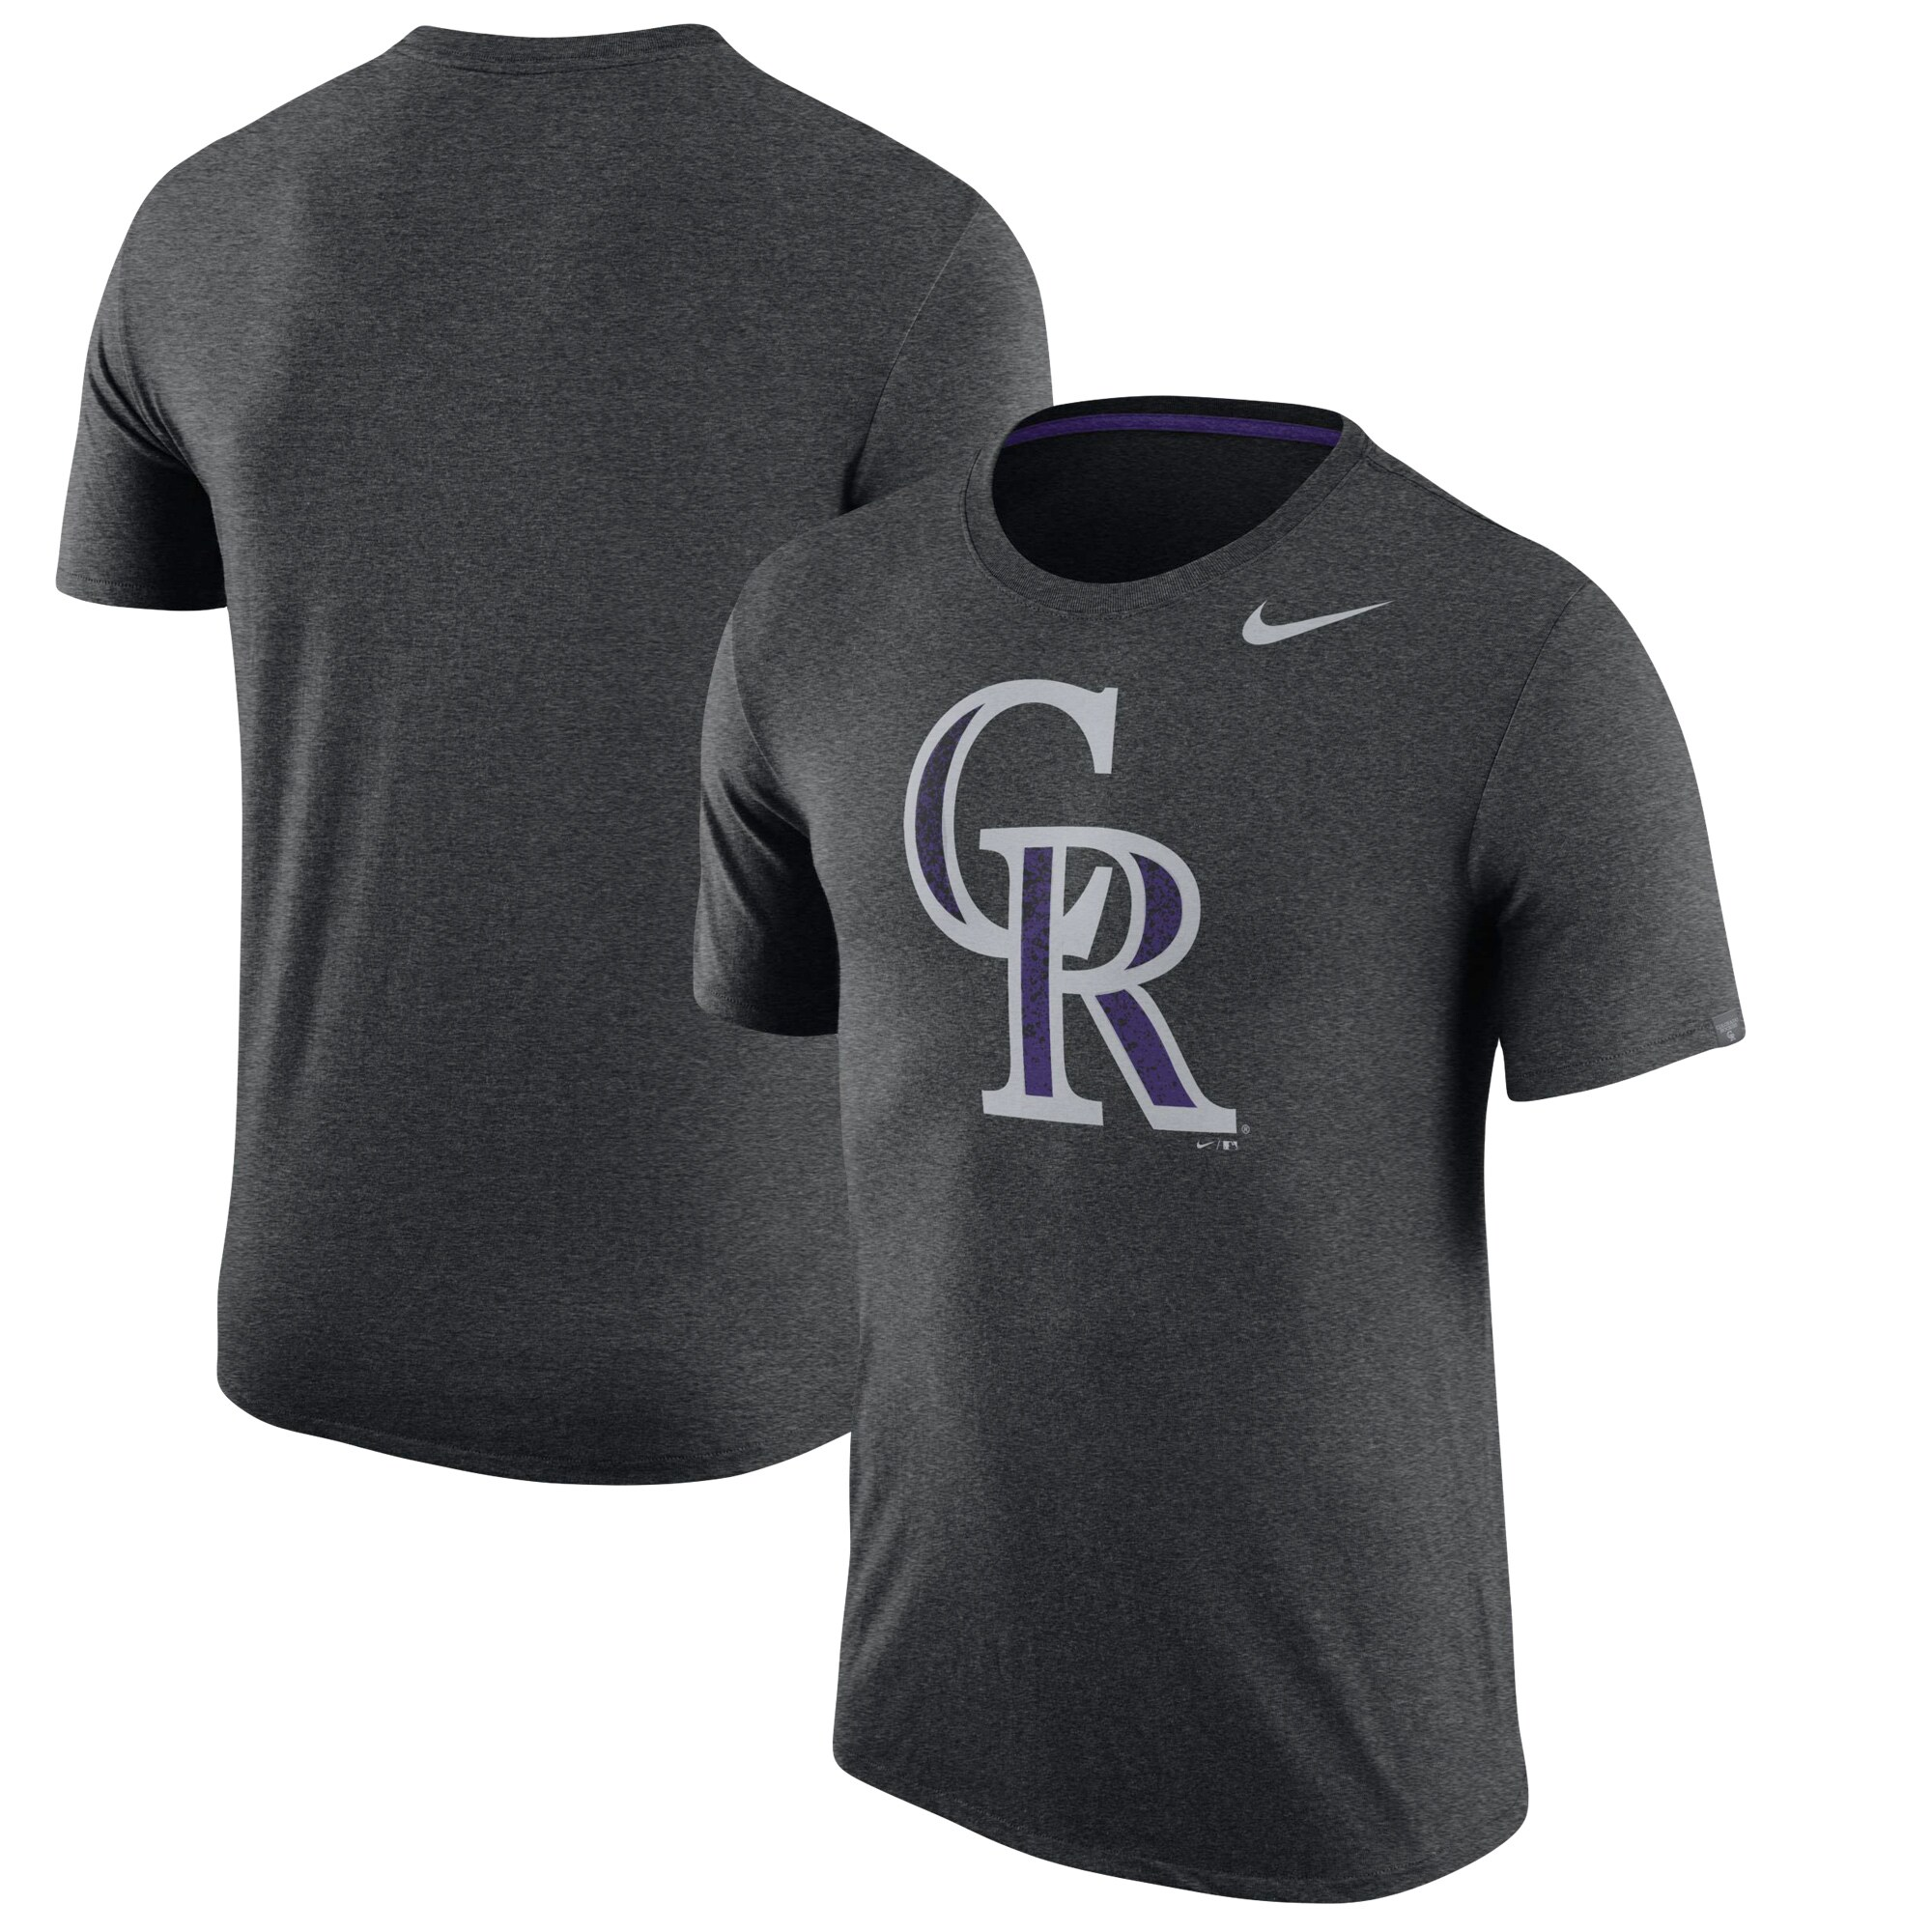 Colorado Rockies Nike Tri-Blend T-Shirt - Heathered Black